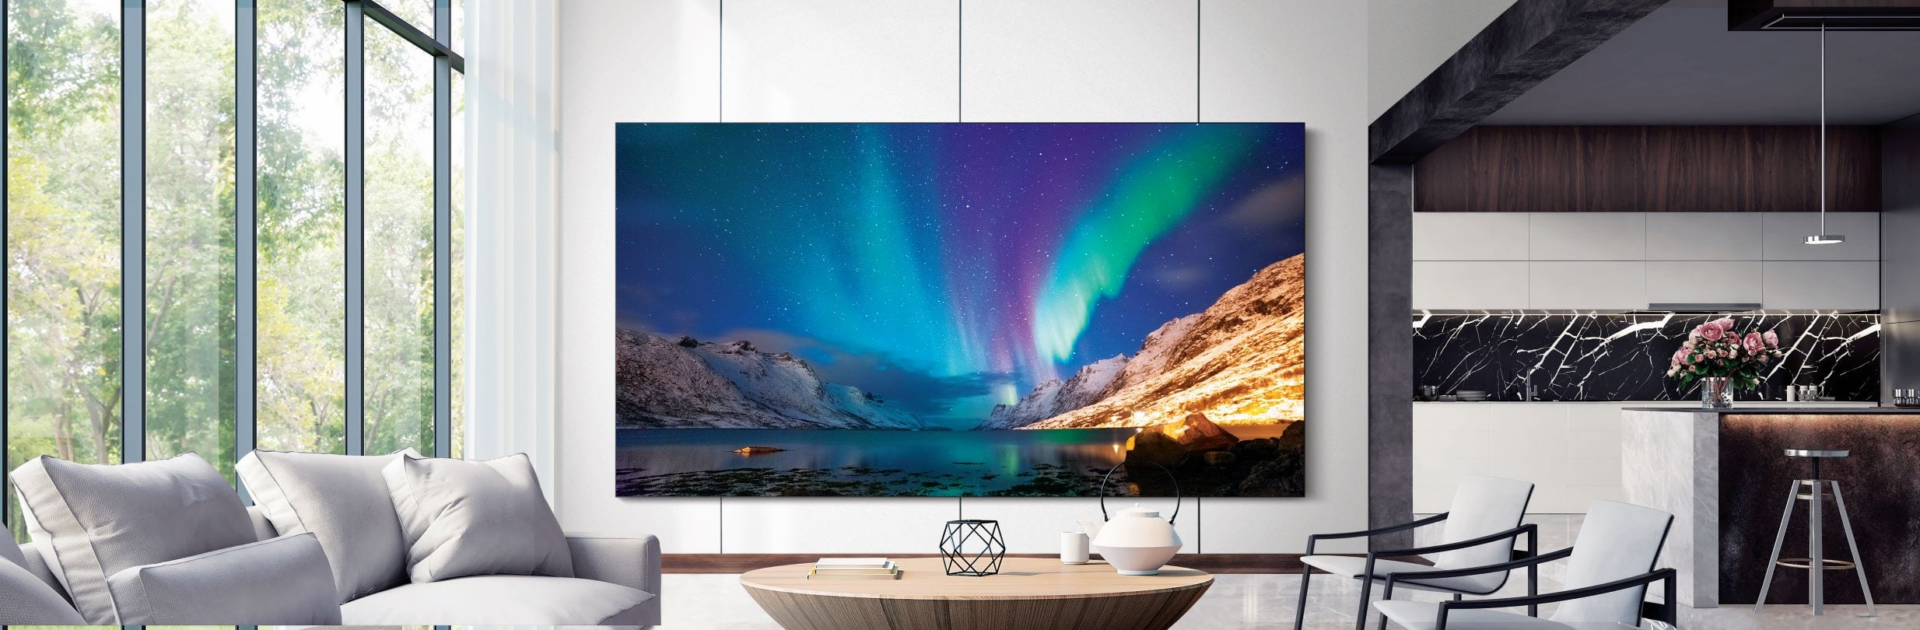 Smart TV MicroLED en CES 2020